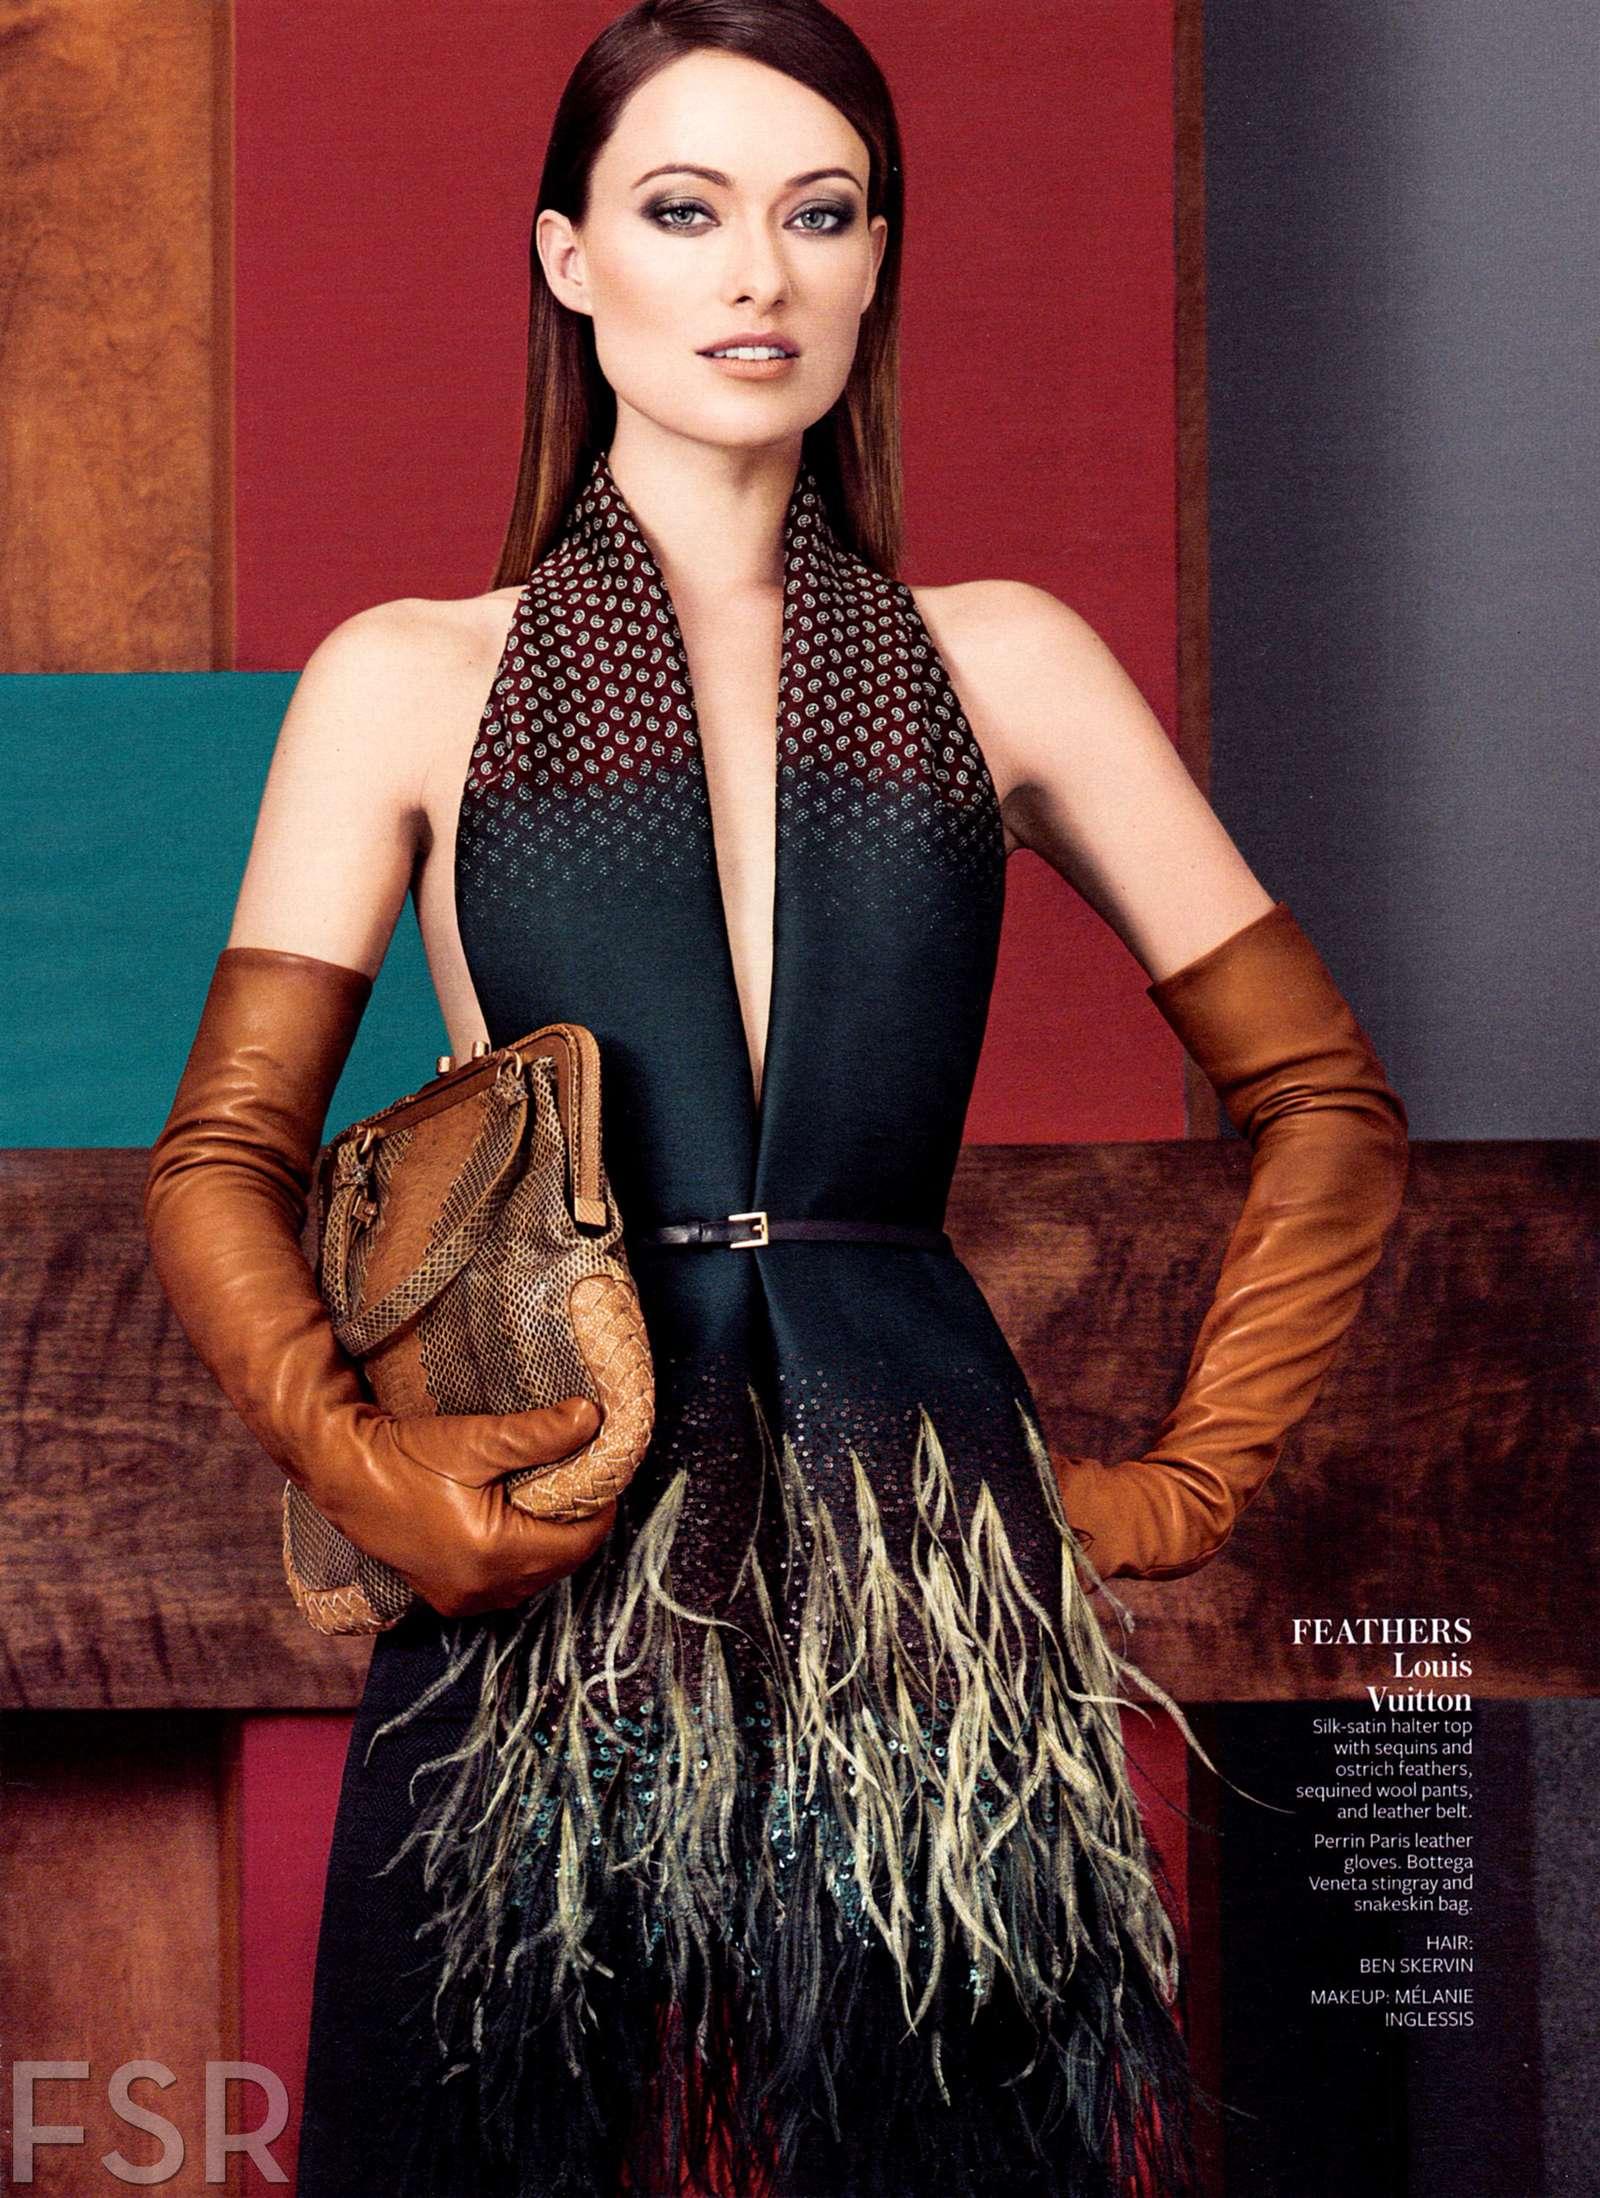 Olivia Wilde Instyle Magazine August 2013